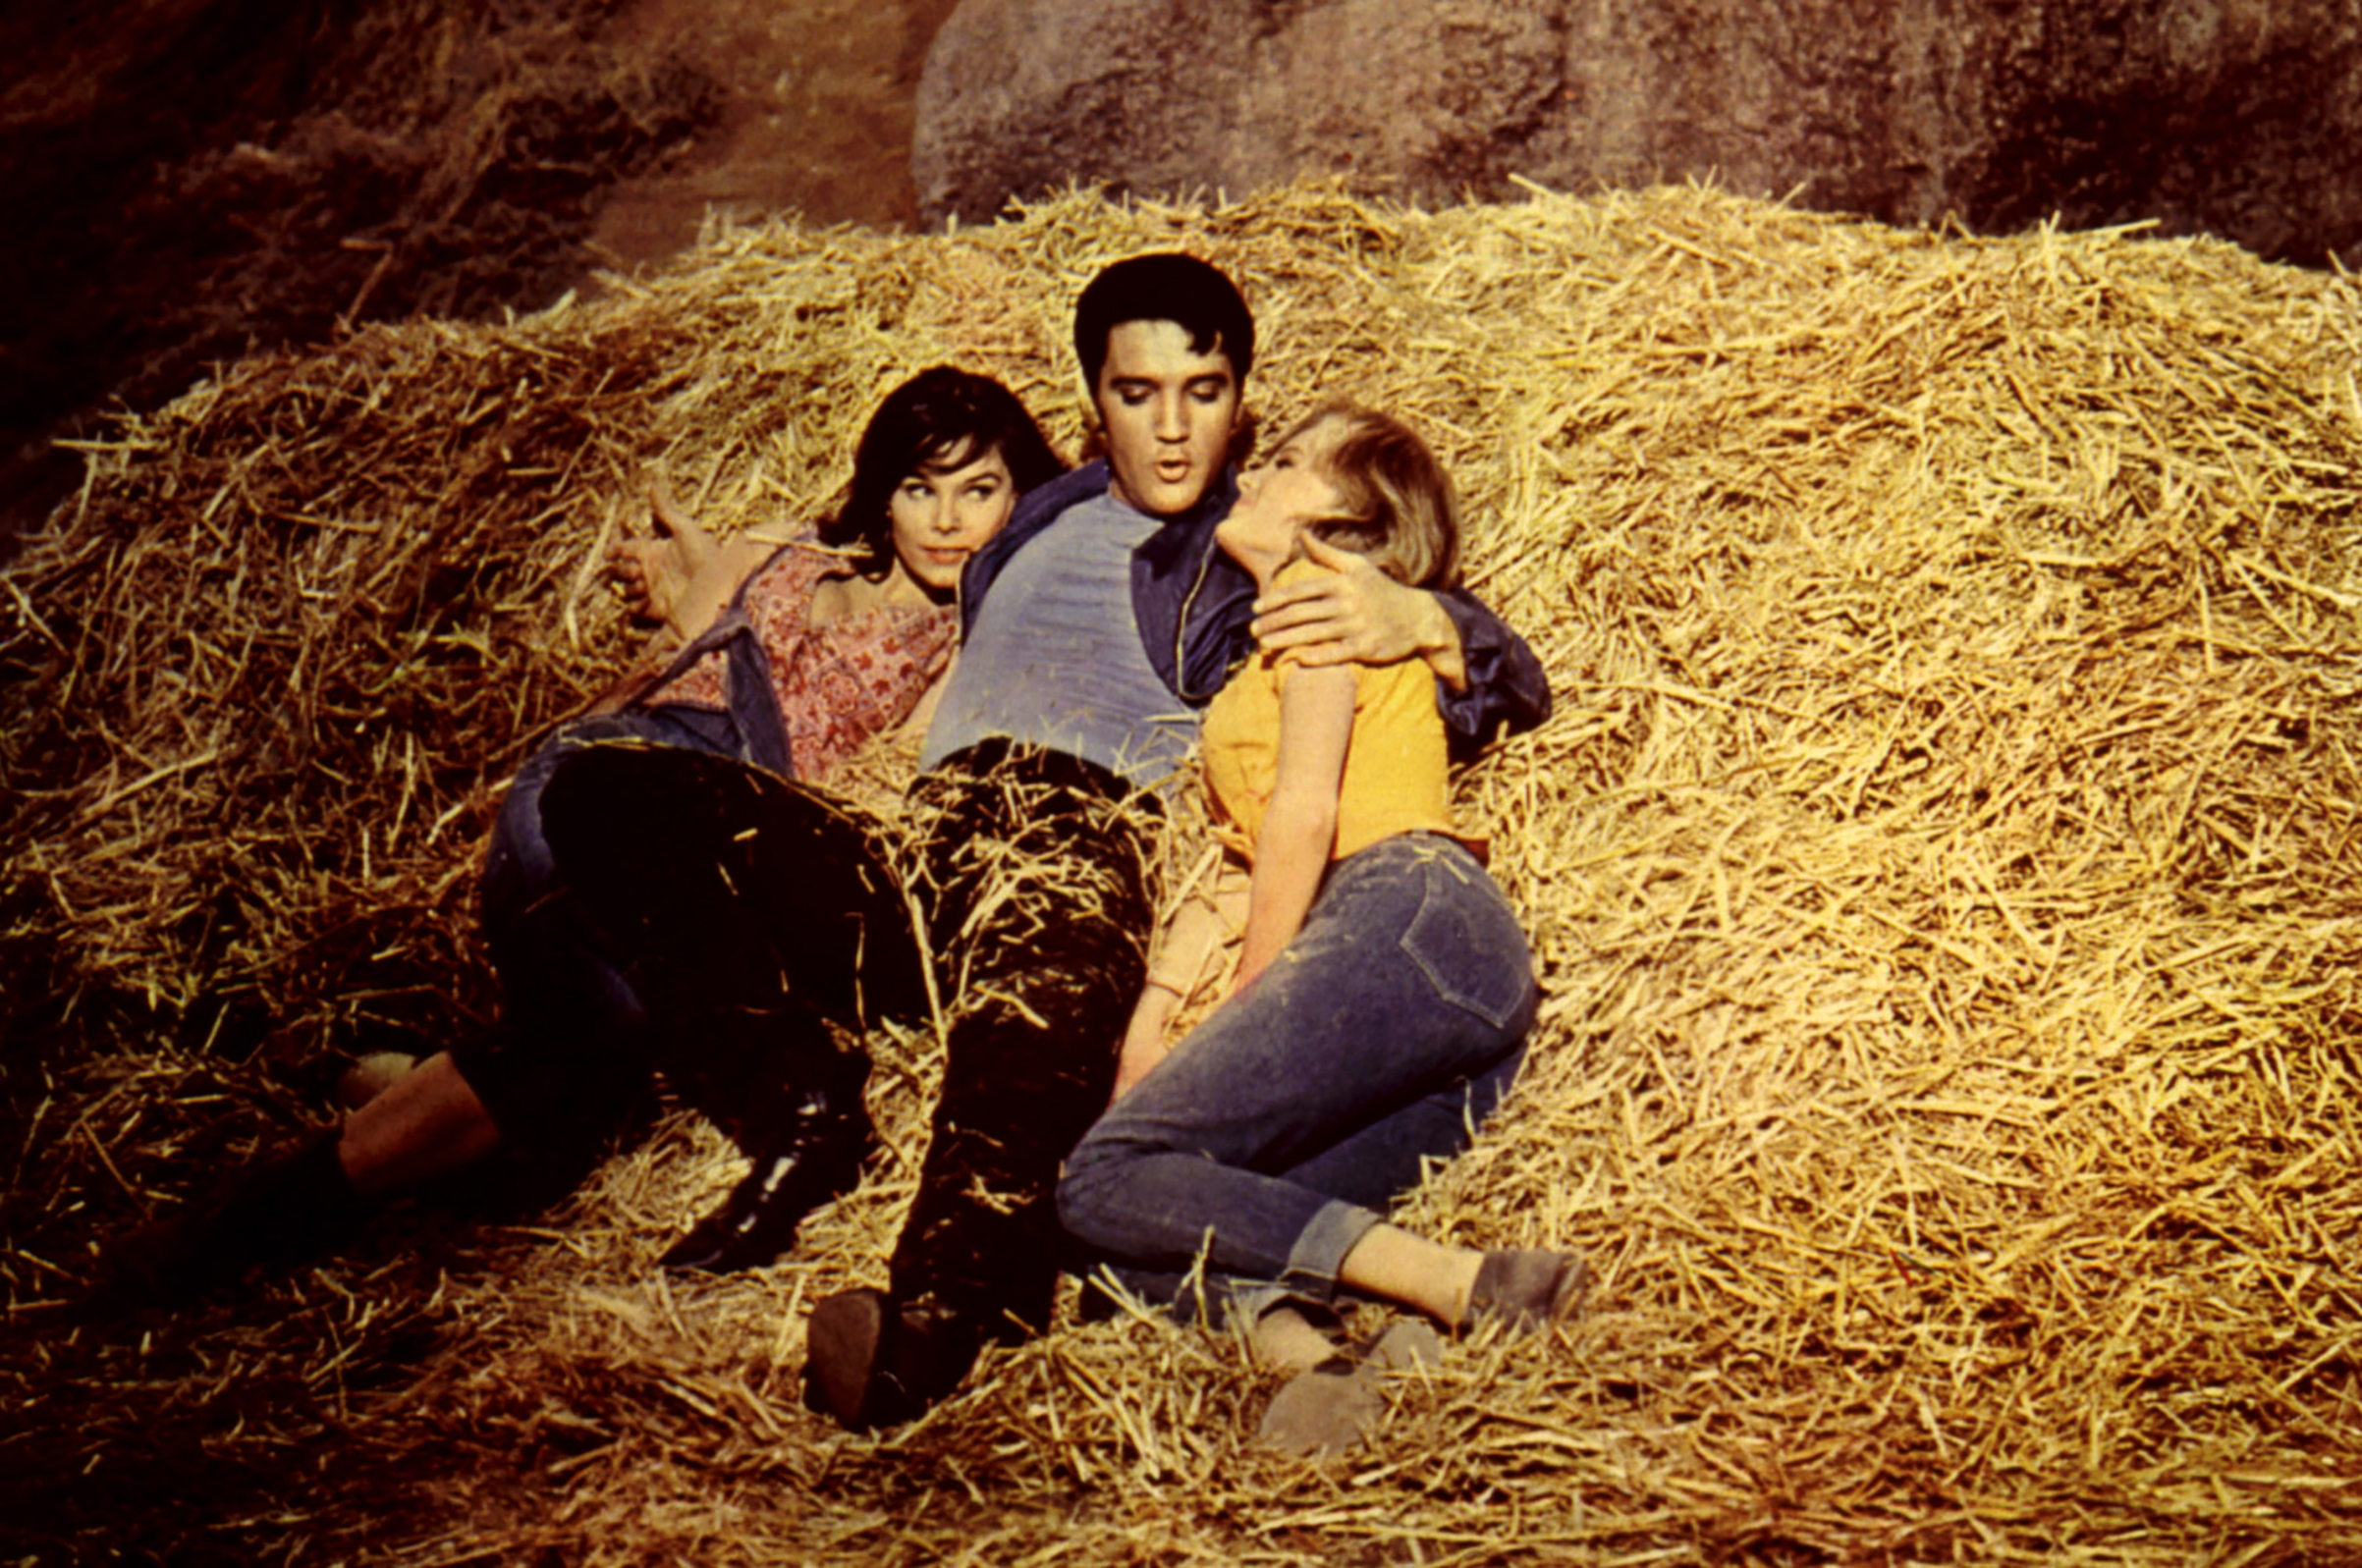 Kissin' Cousins : 1964, Elvis with Yvonne Craig and Pamela Austin.